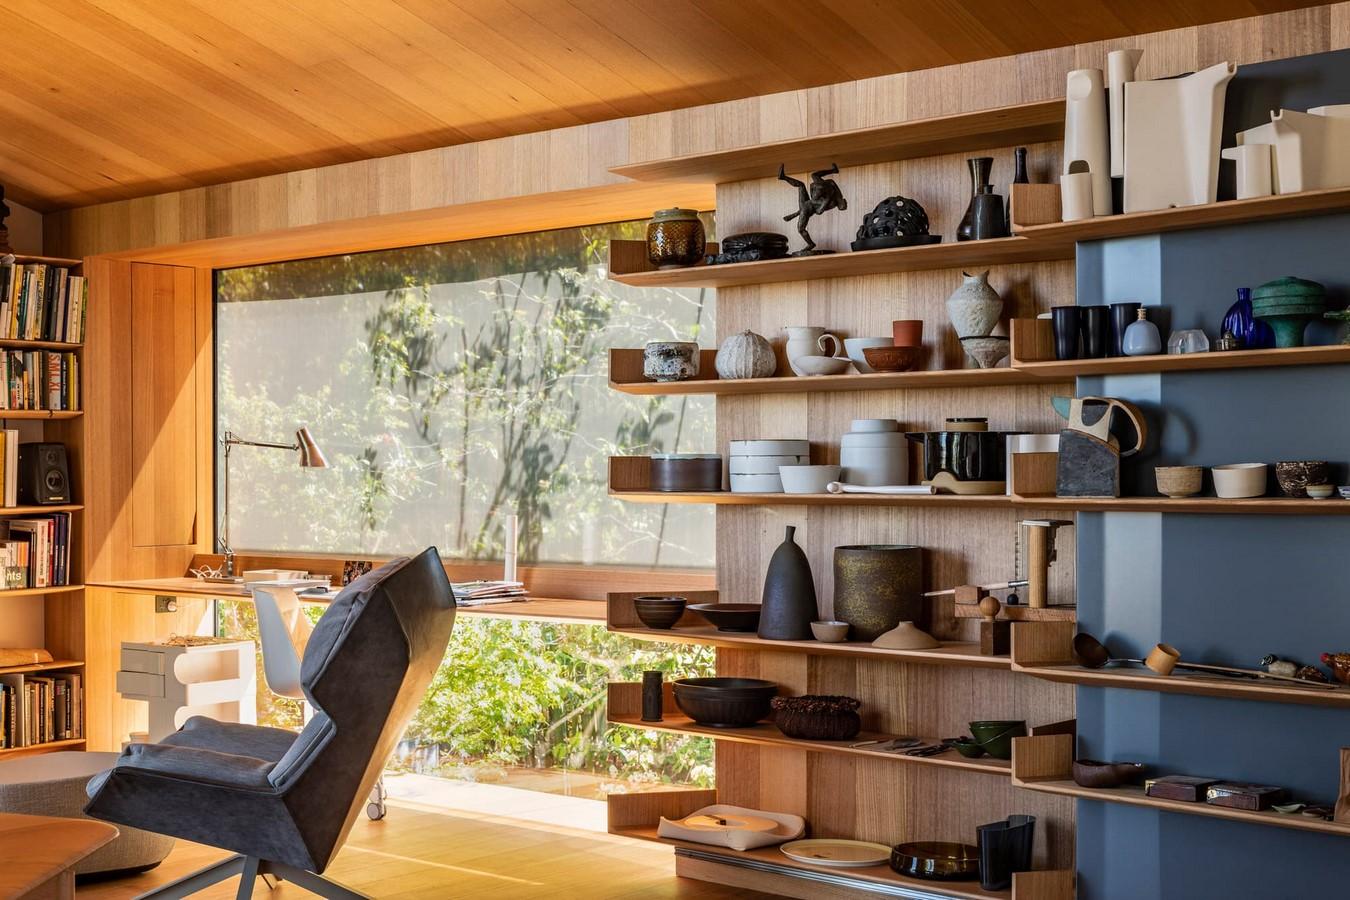 Kew Residence by John Wardle Architects An Australian Modern House - Sheet9